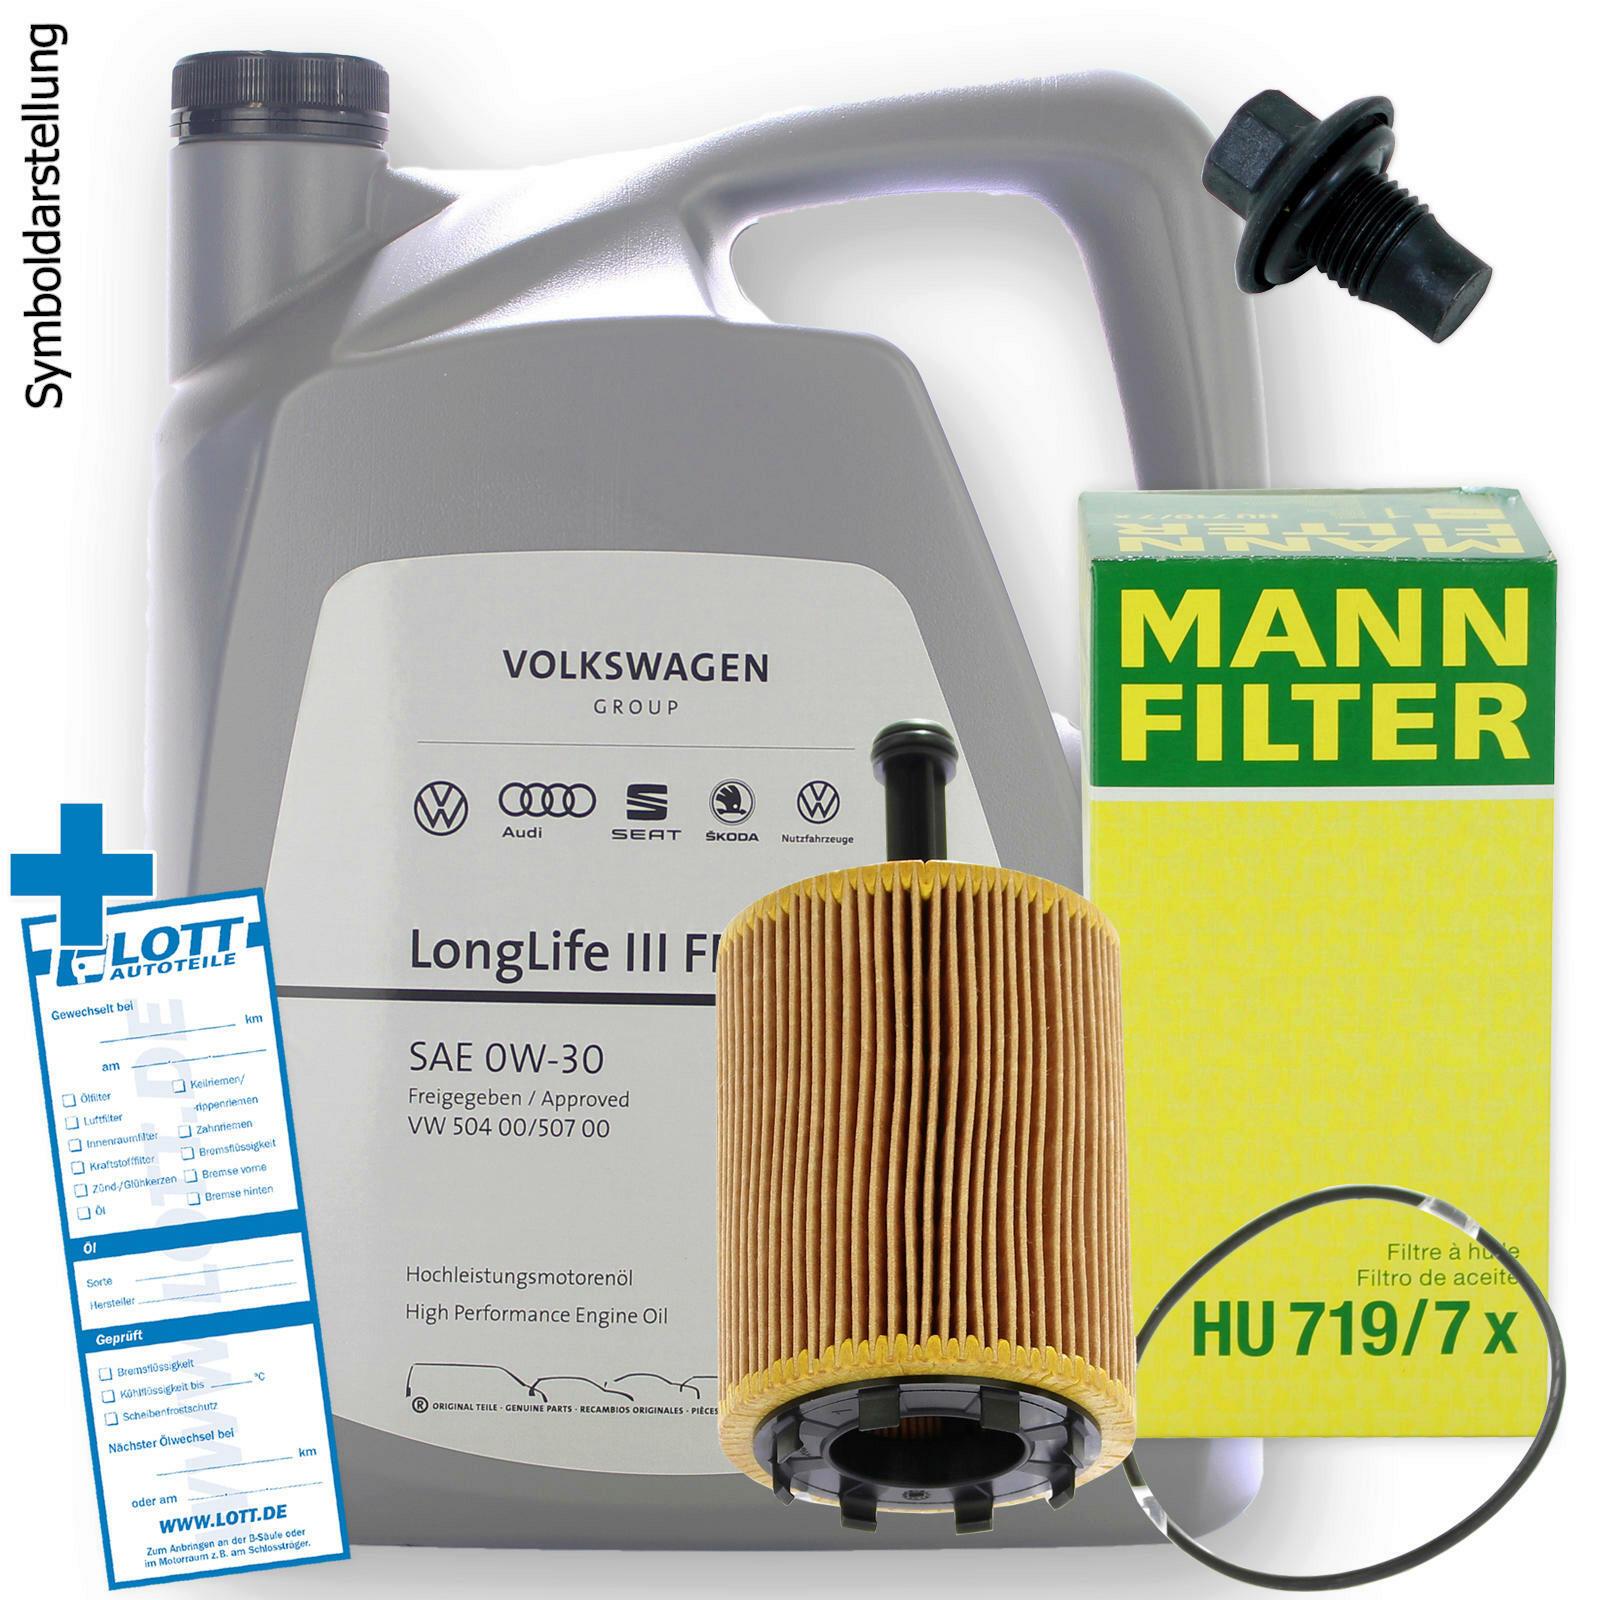 Ölwechsel Set VW 0W-30 Motoröl + Ölfilter + Ablassschraube